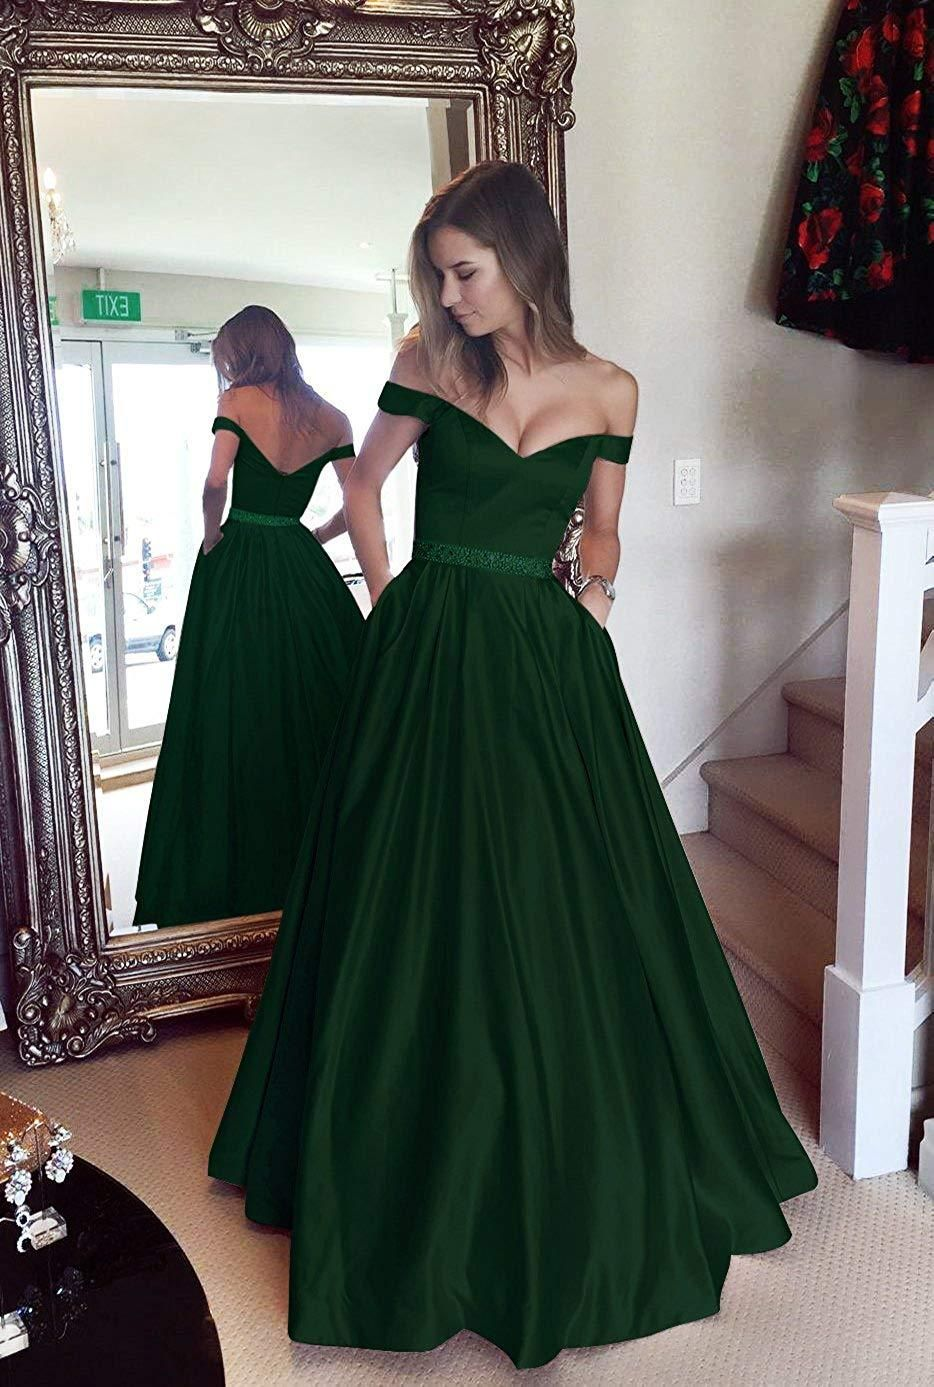 786dc93d62fa5 Long Satin Emerald Green Off the Shoulder Prom Dress Formal Evening ...